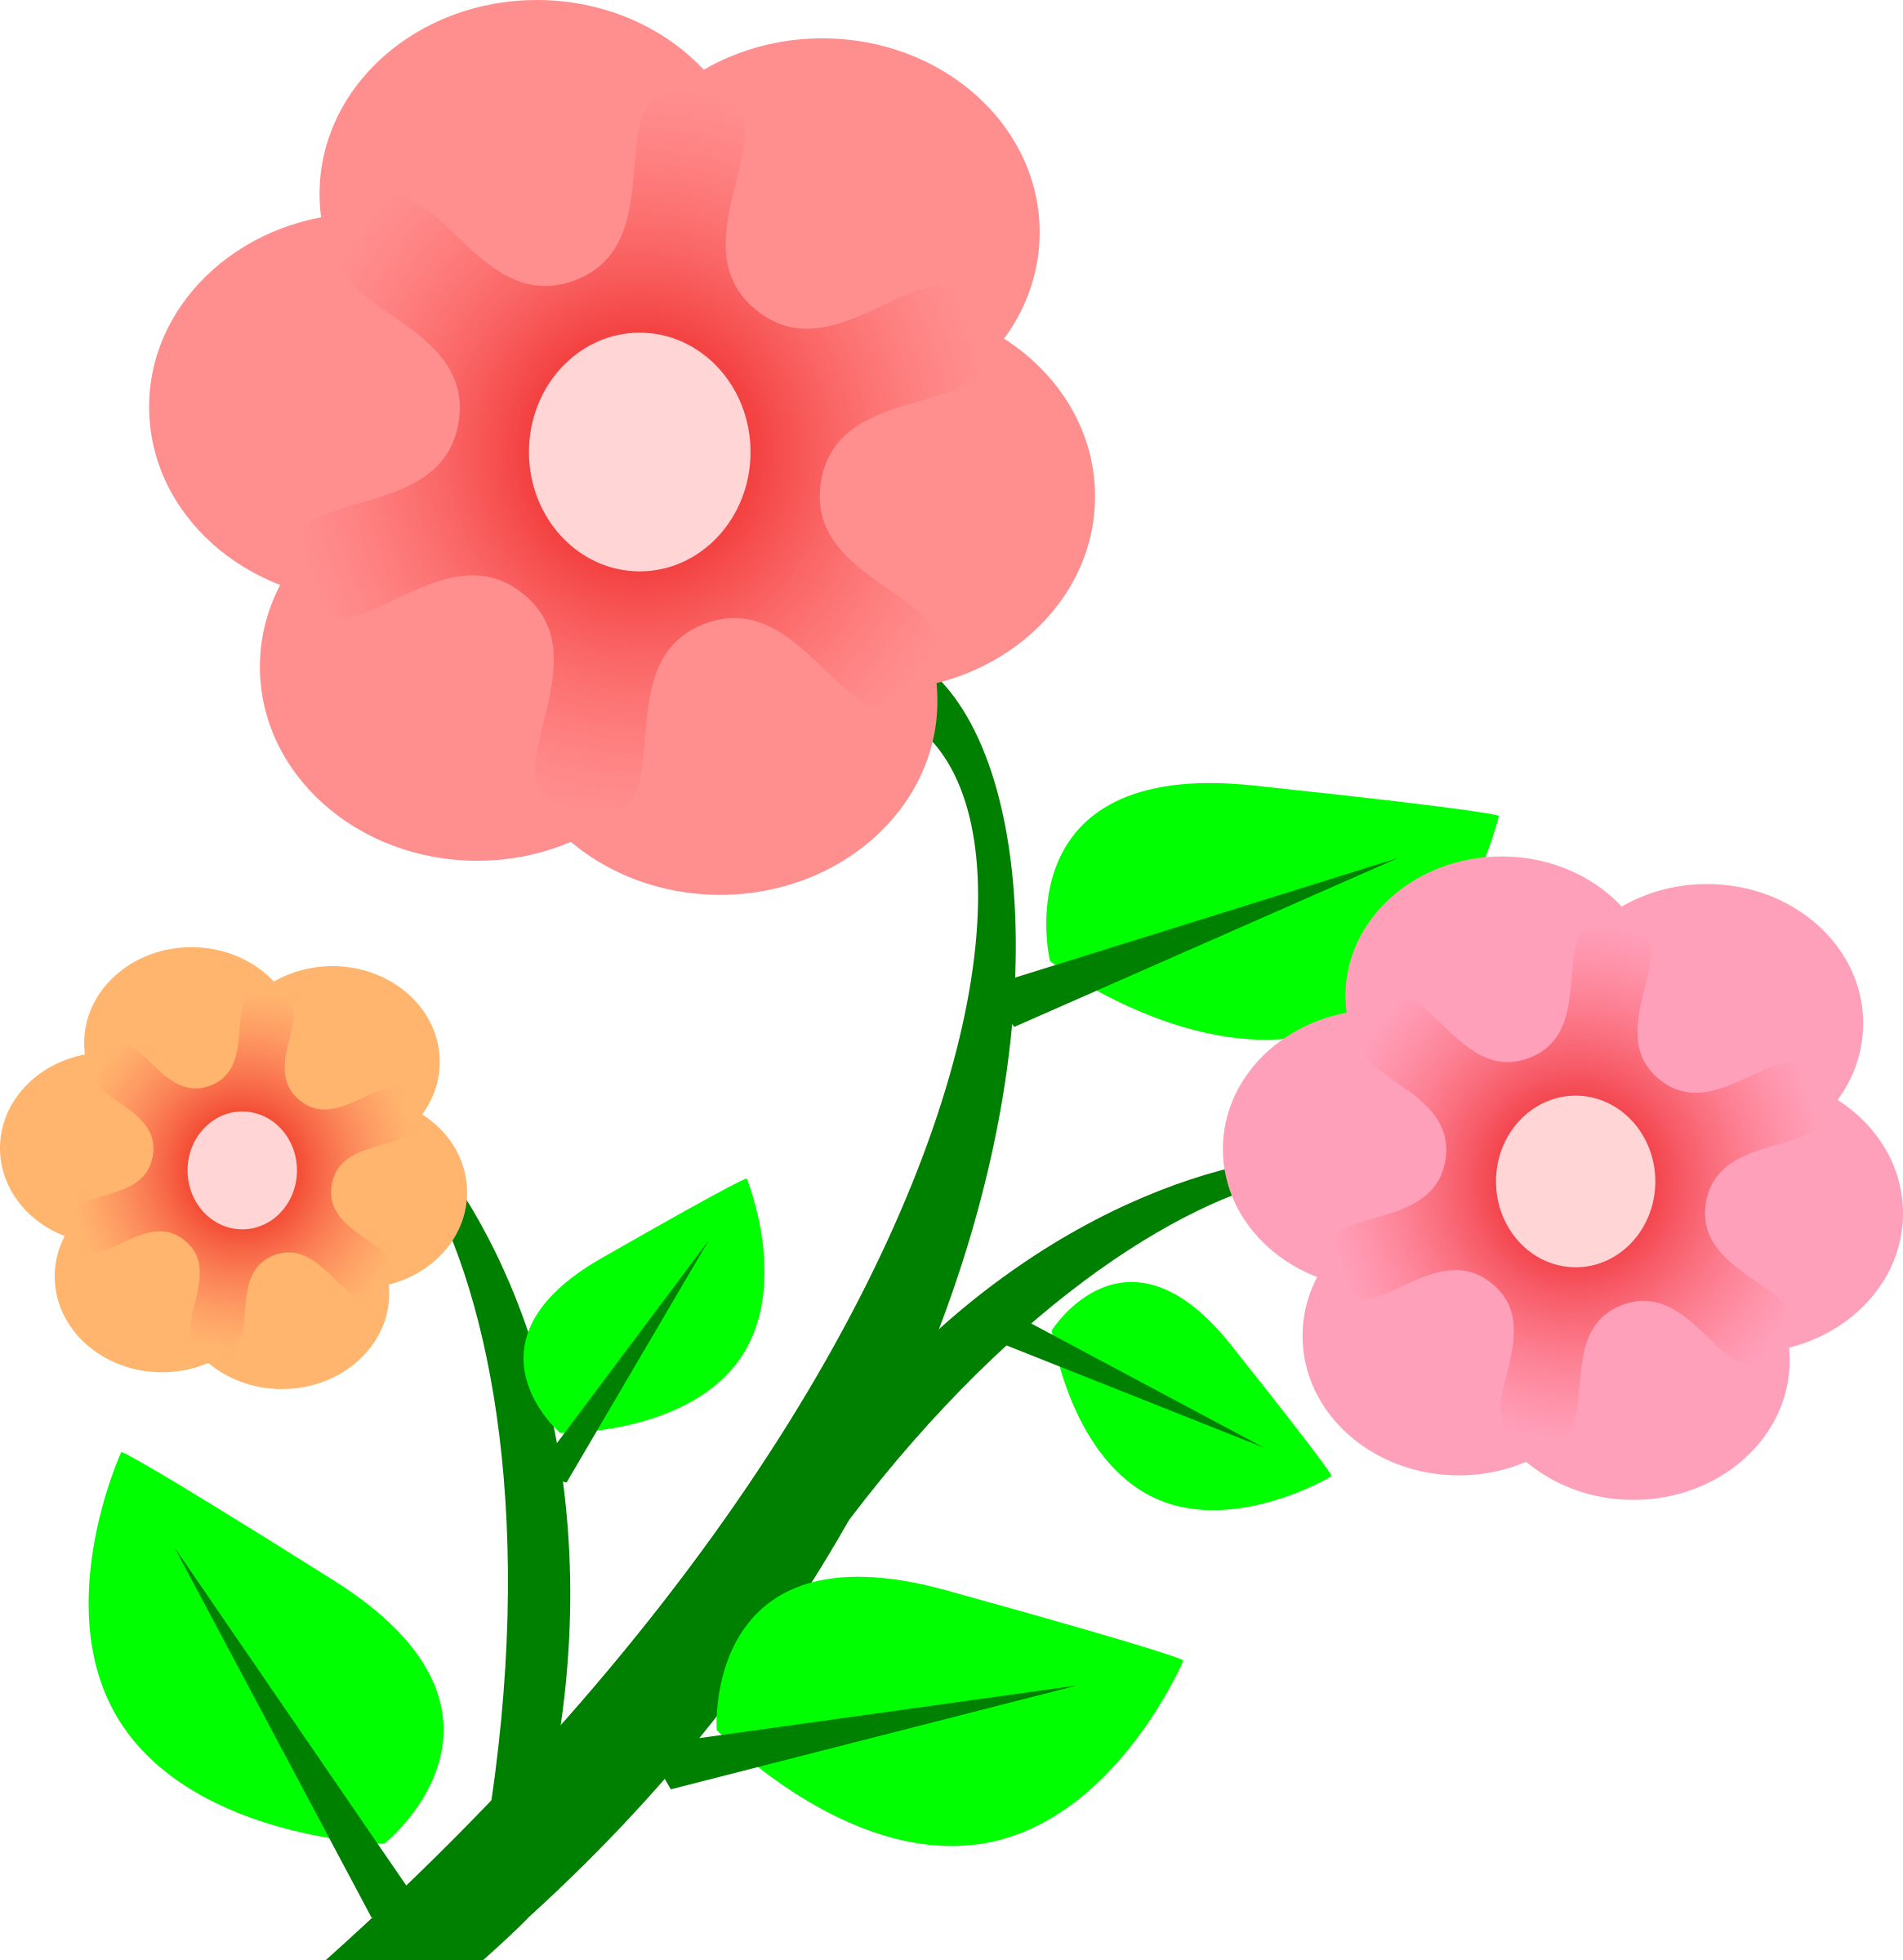 Petal clipart big flower Flowers Art Clip Flowers Flower